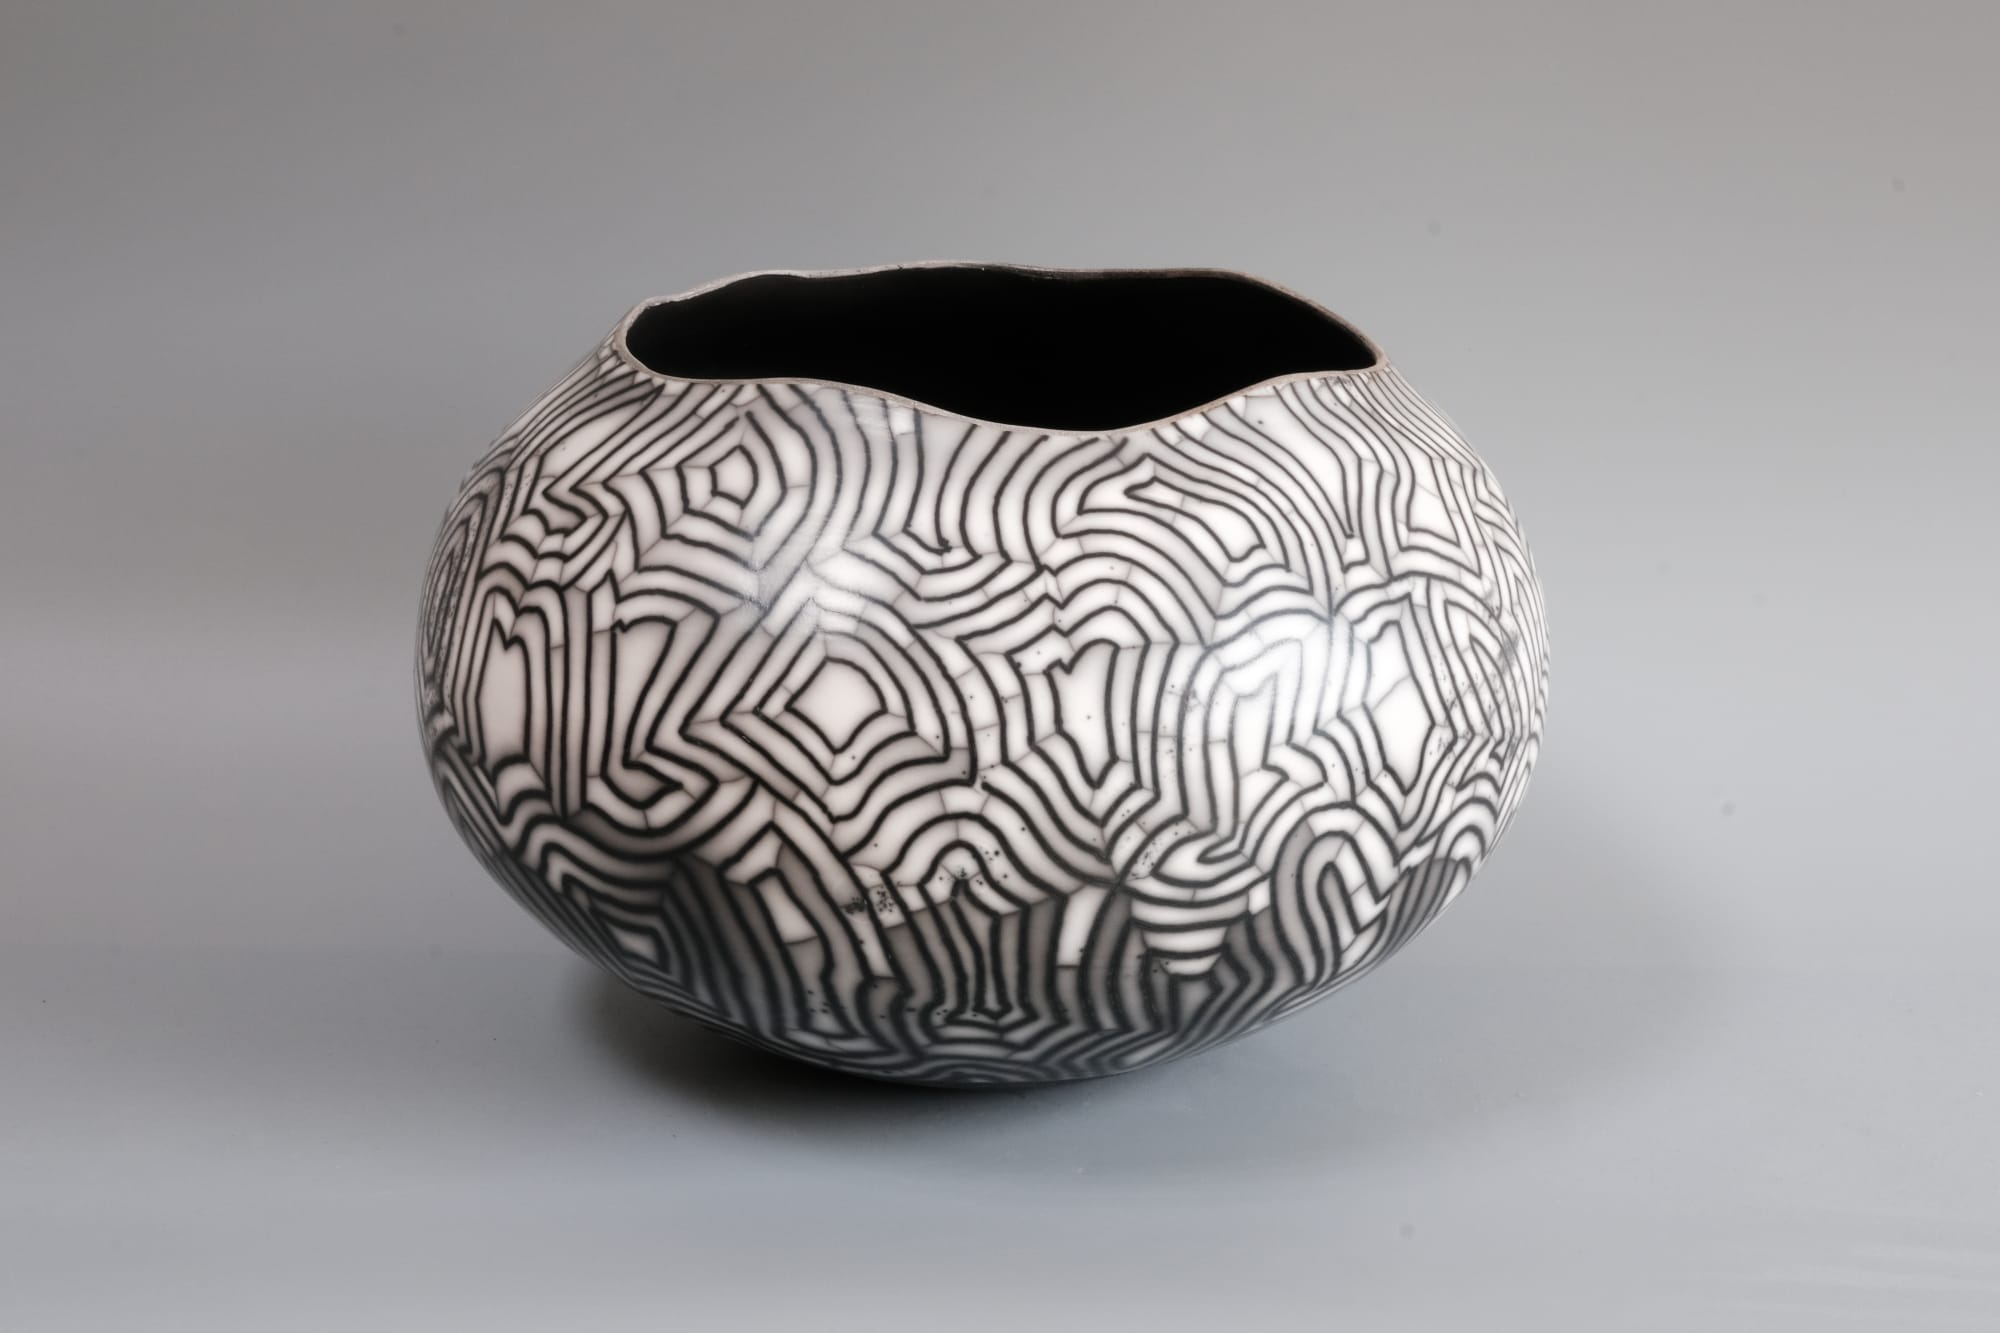 david roberts: brand new raku ceramics by the internationally renowned artist